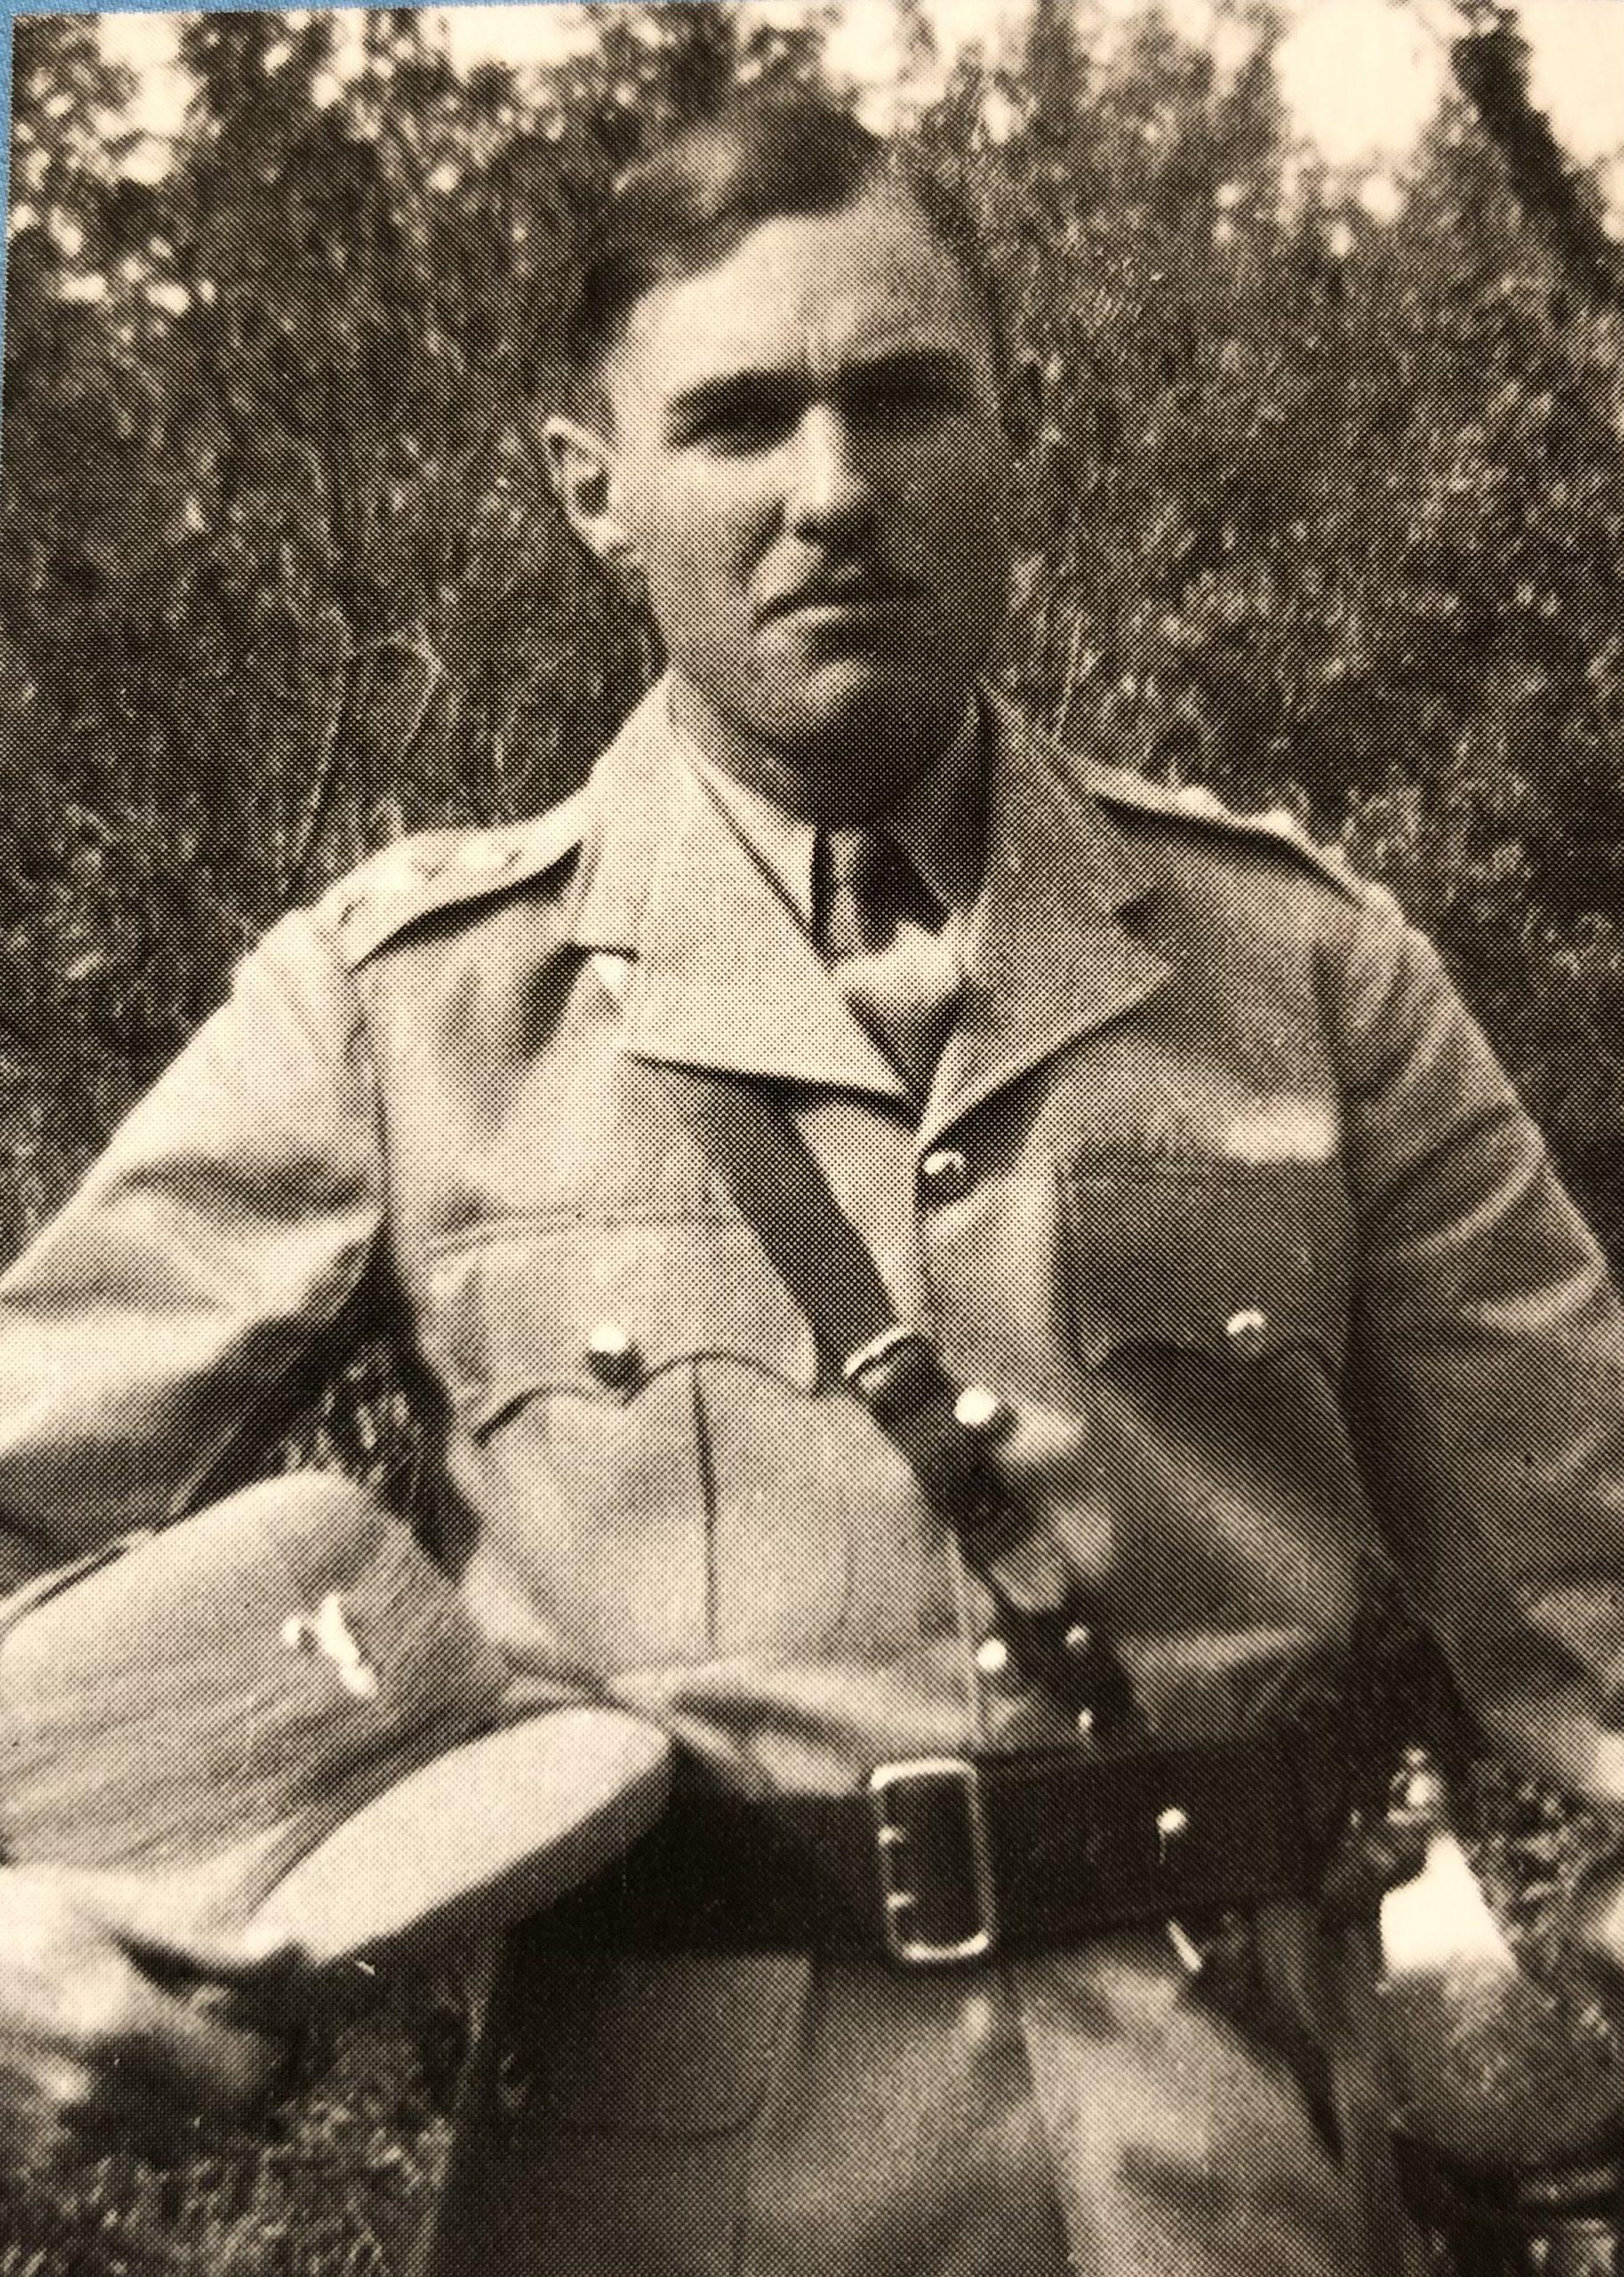 Major Brown